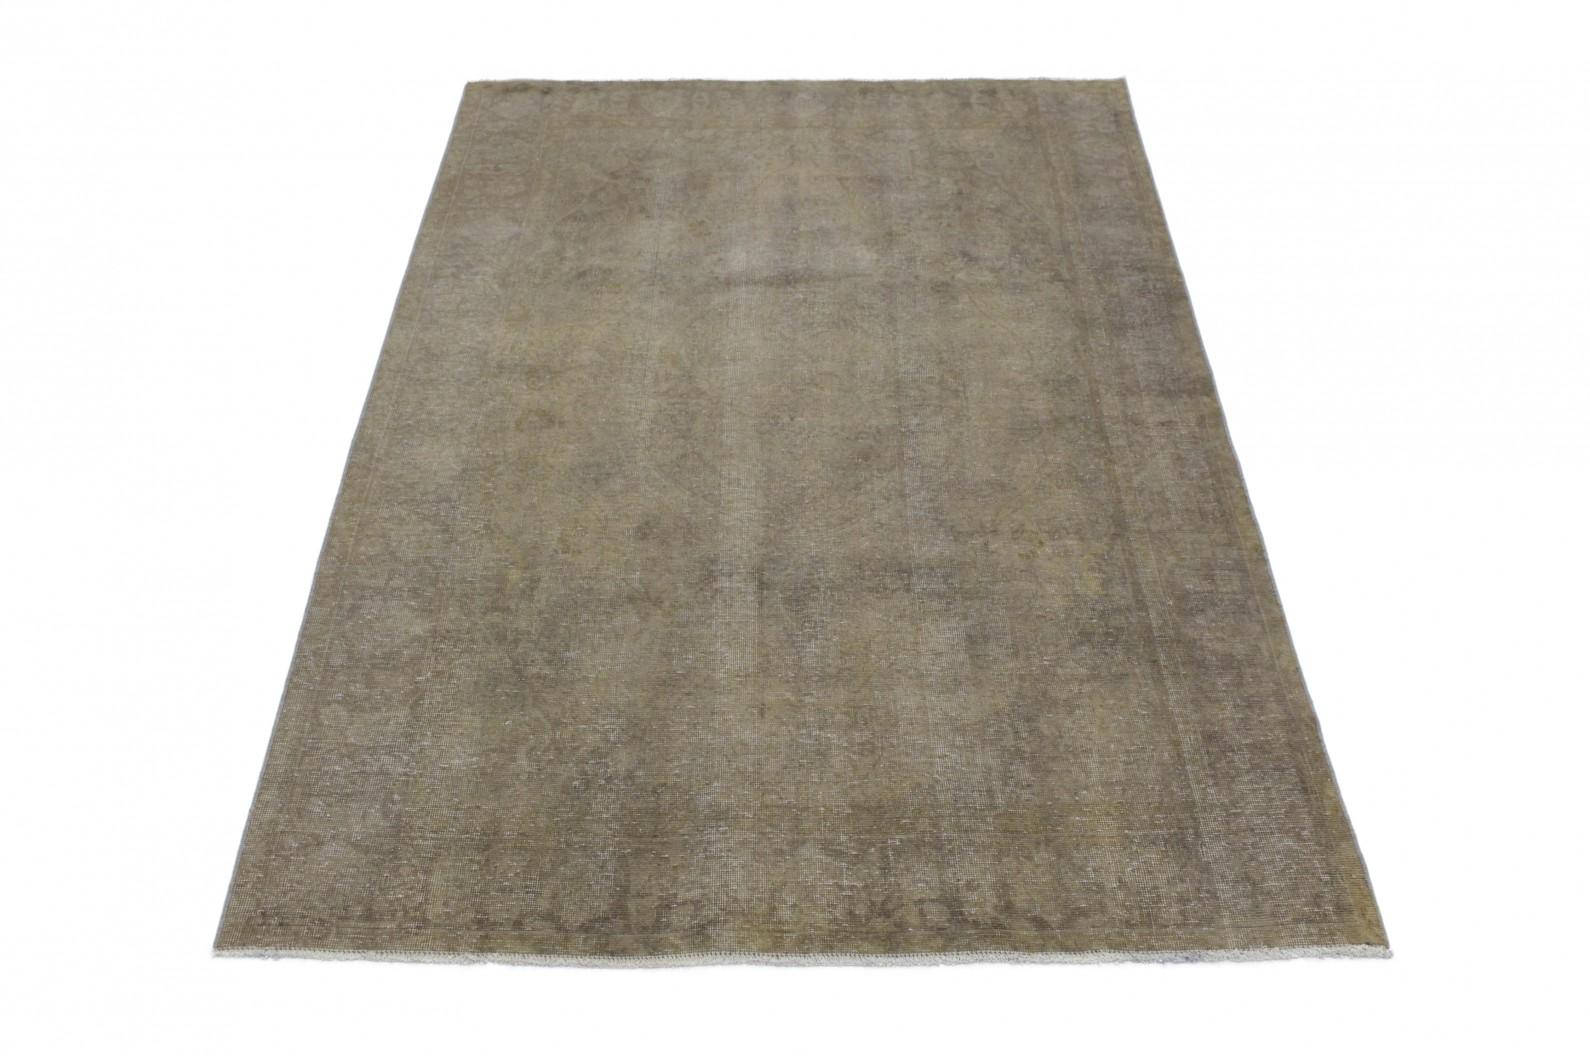 Vintage Teppich Beige Grau in 290x190 (1 / 4)